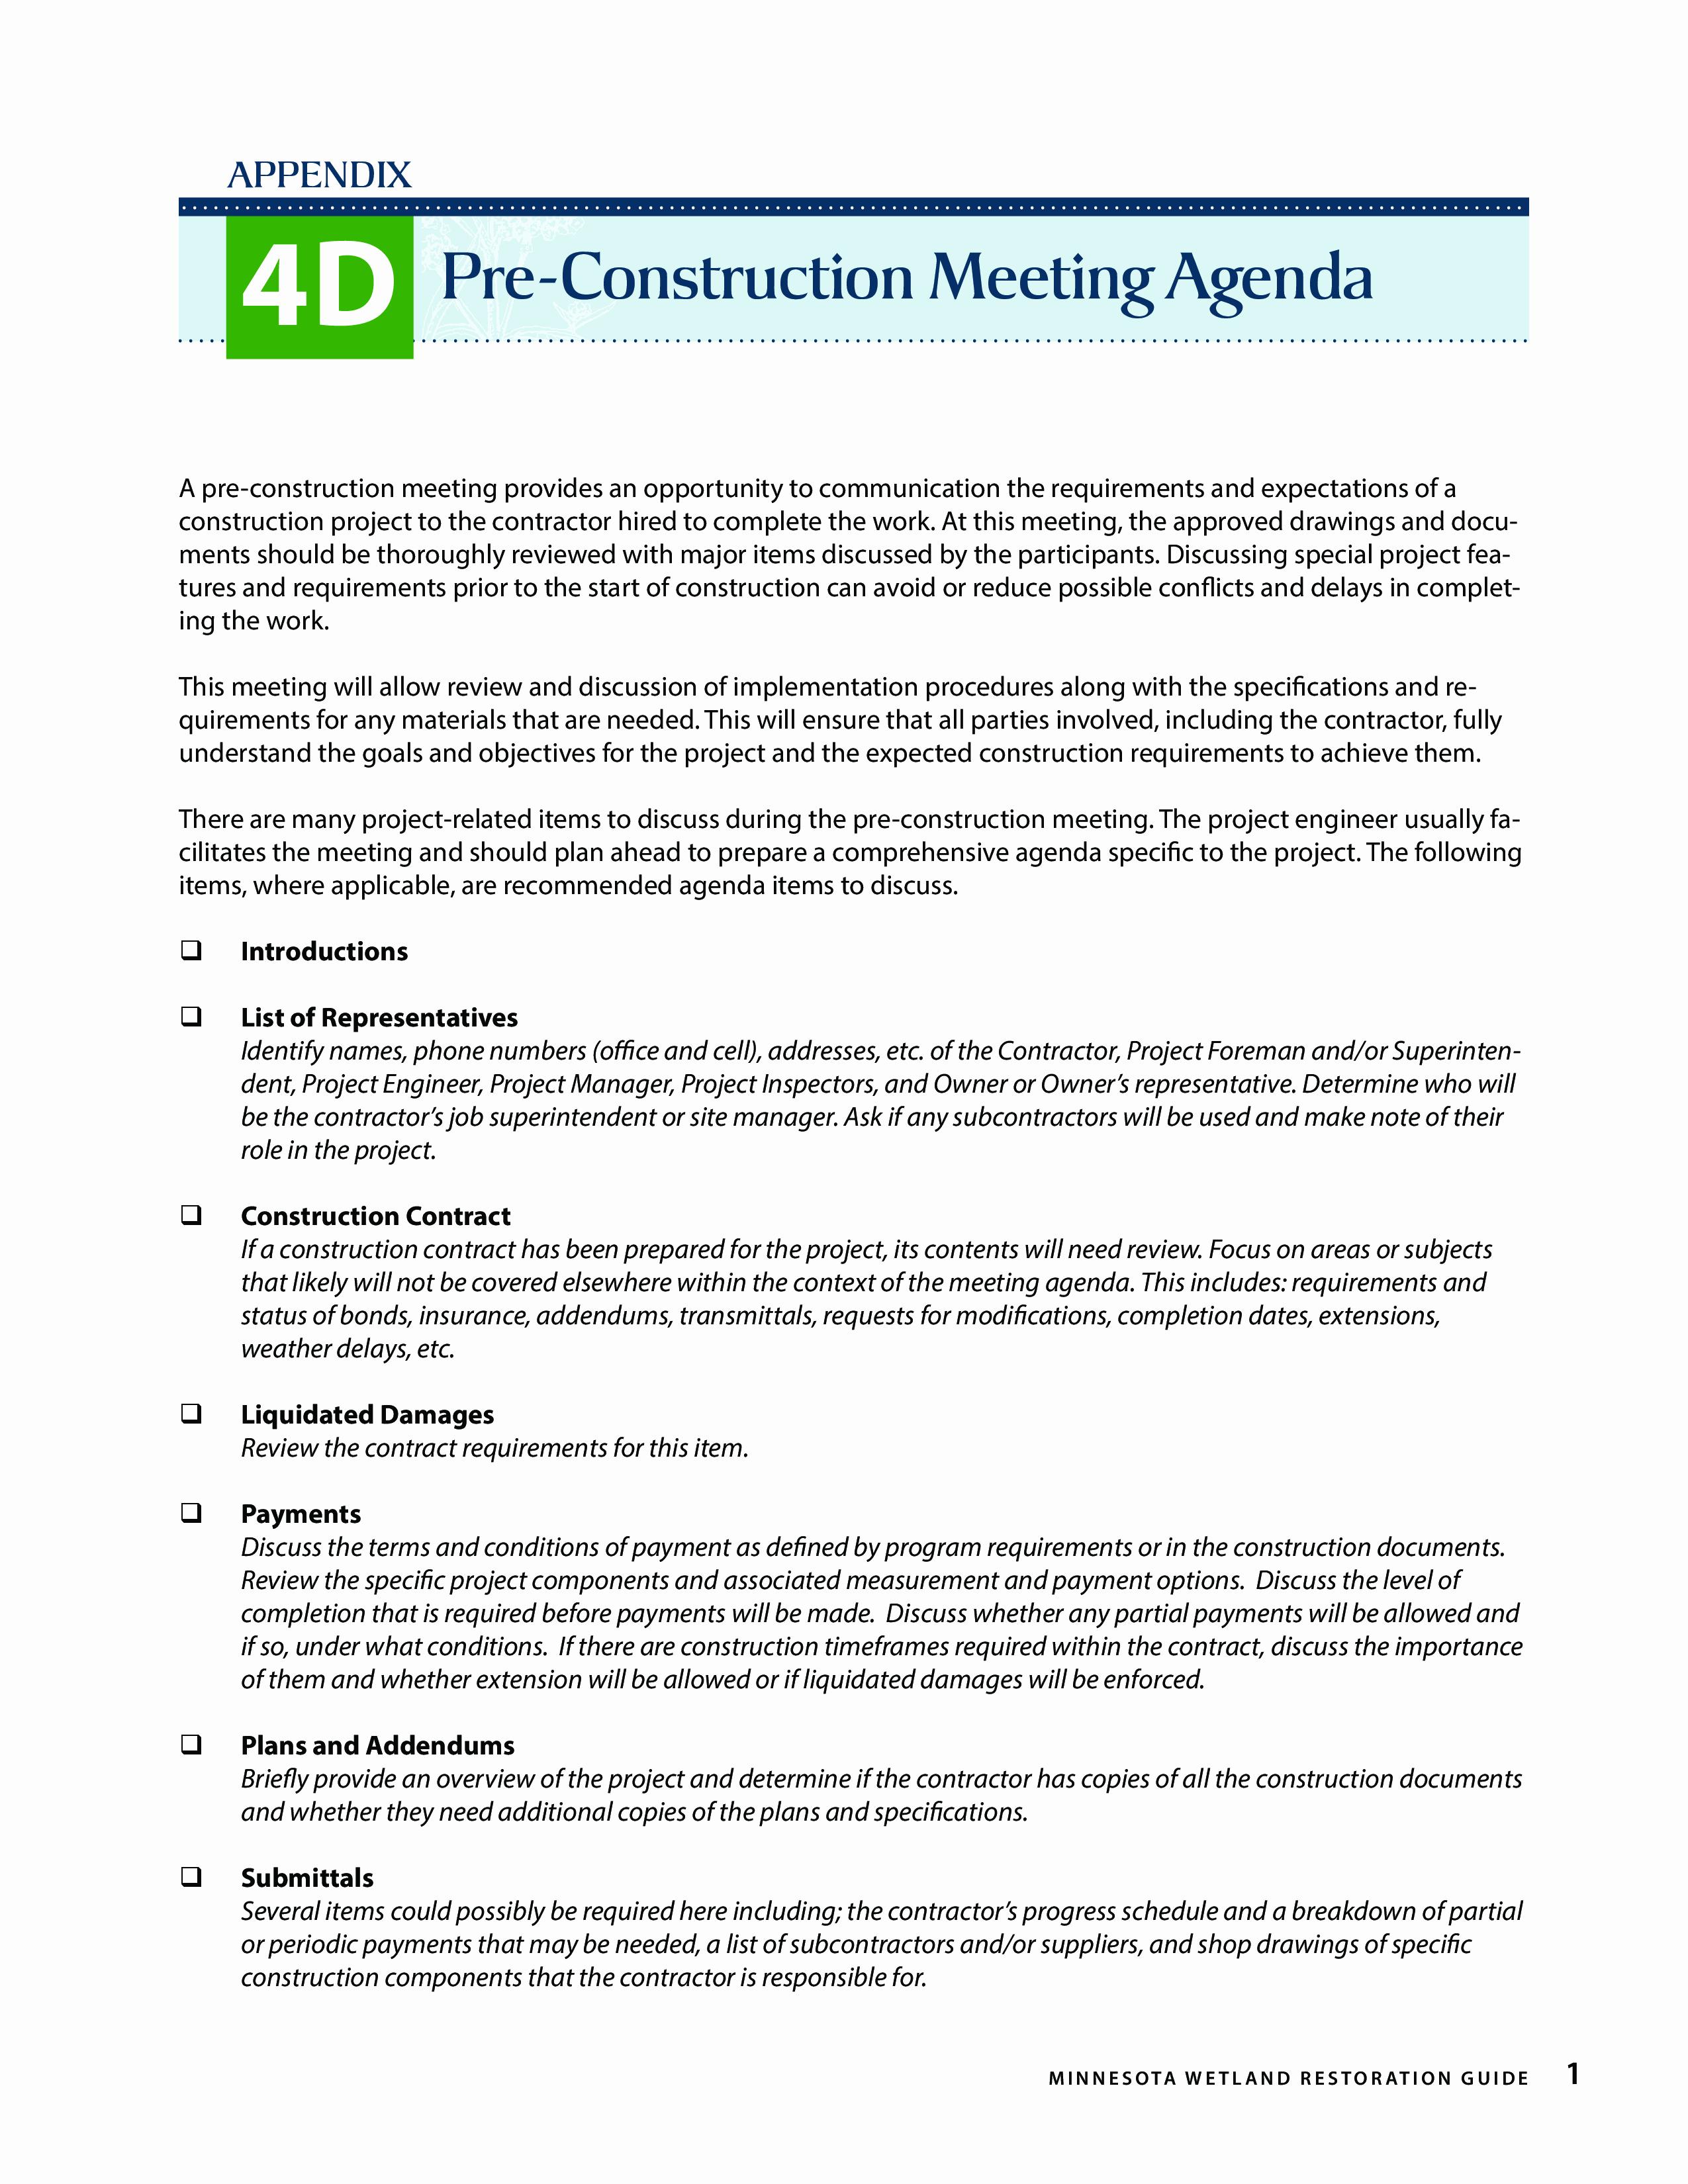 Pre Construction Meeting Agenda Template Beautiful Free Pre Construction Meeting Agenda